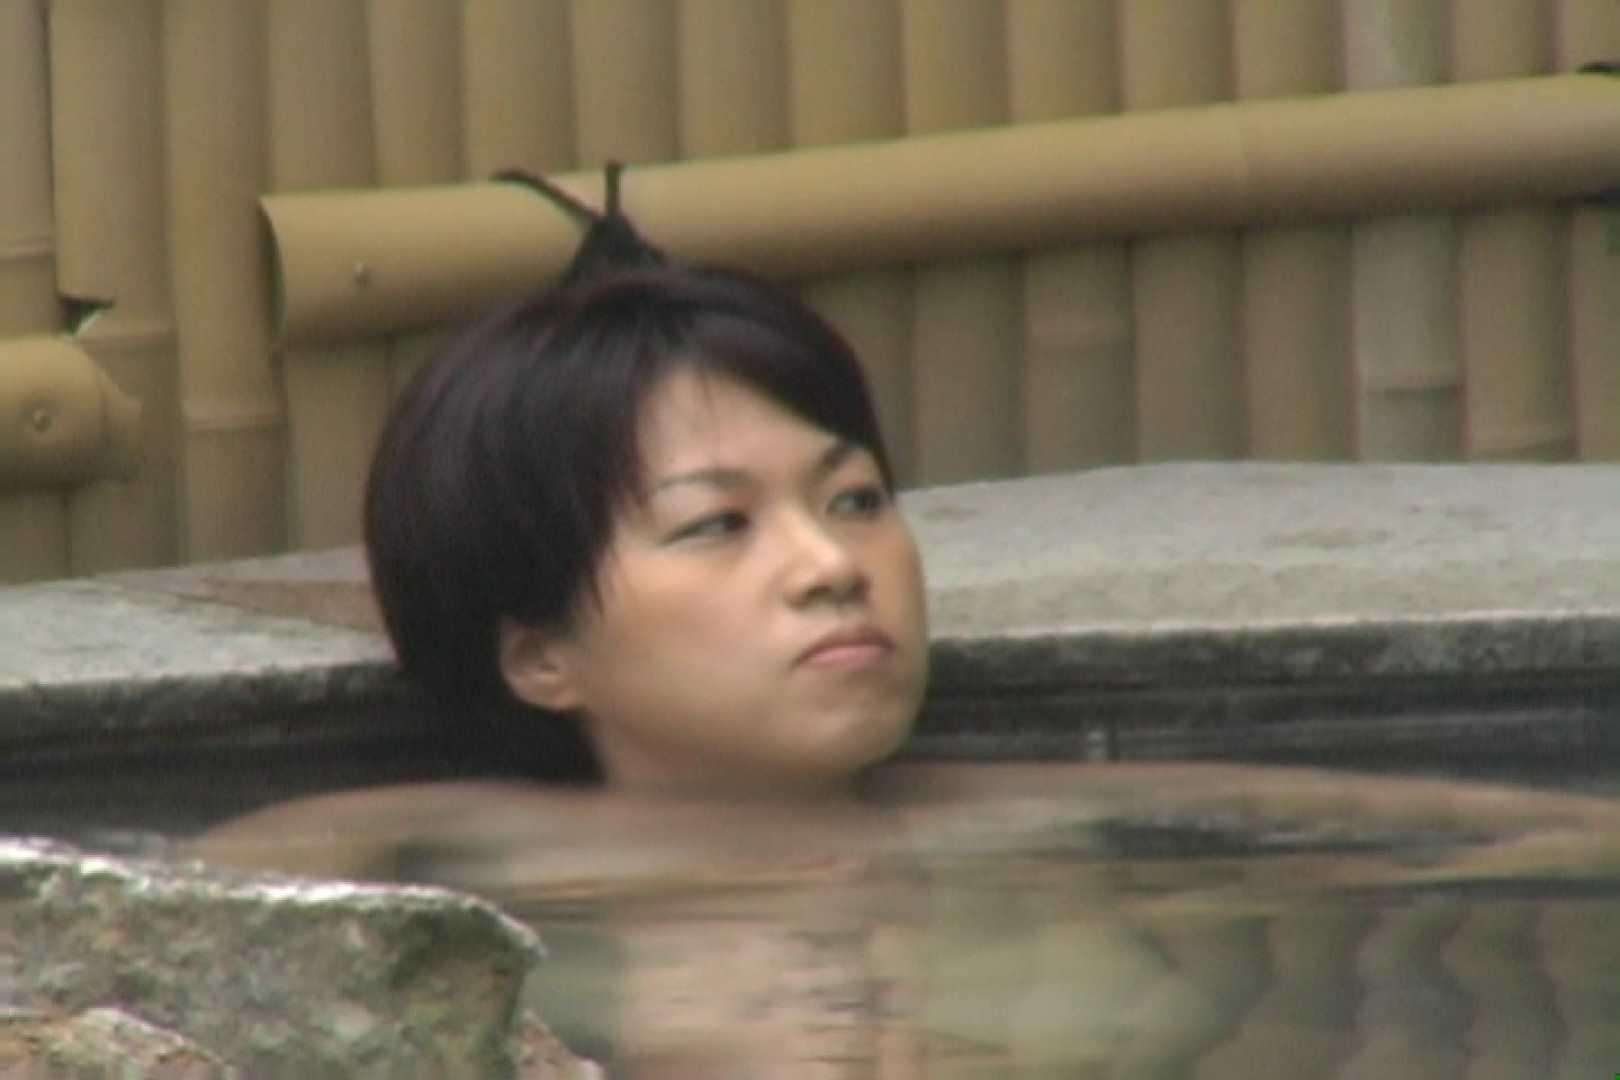 Aquaな露天風呂Vol.624 露天風呂編 | 盗撮シリーズ  88PIX 45